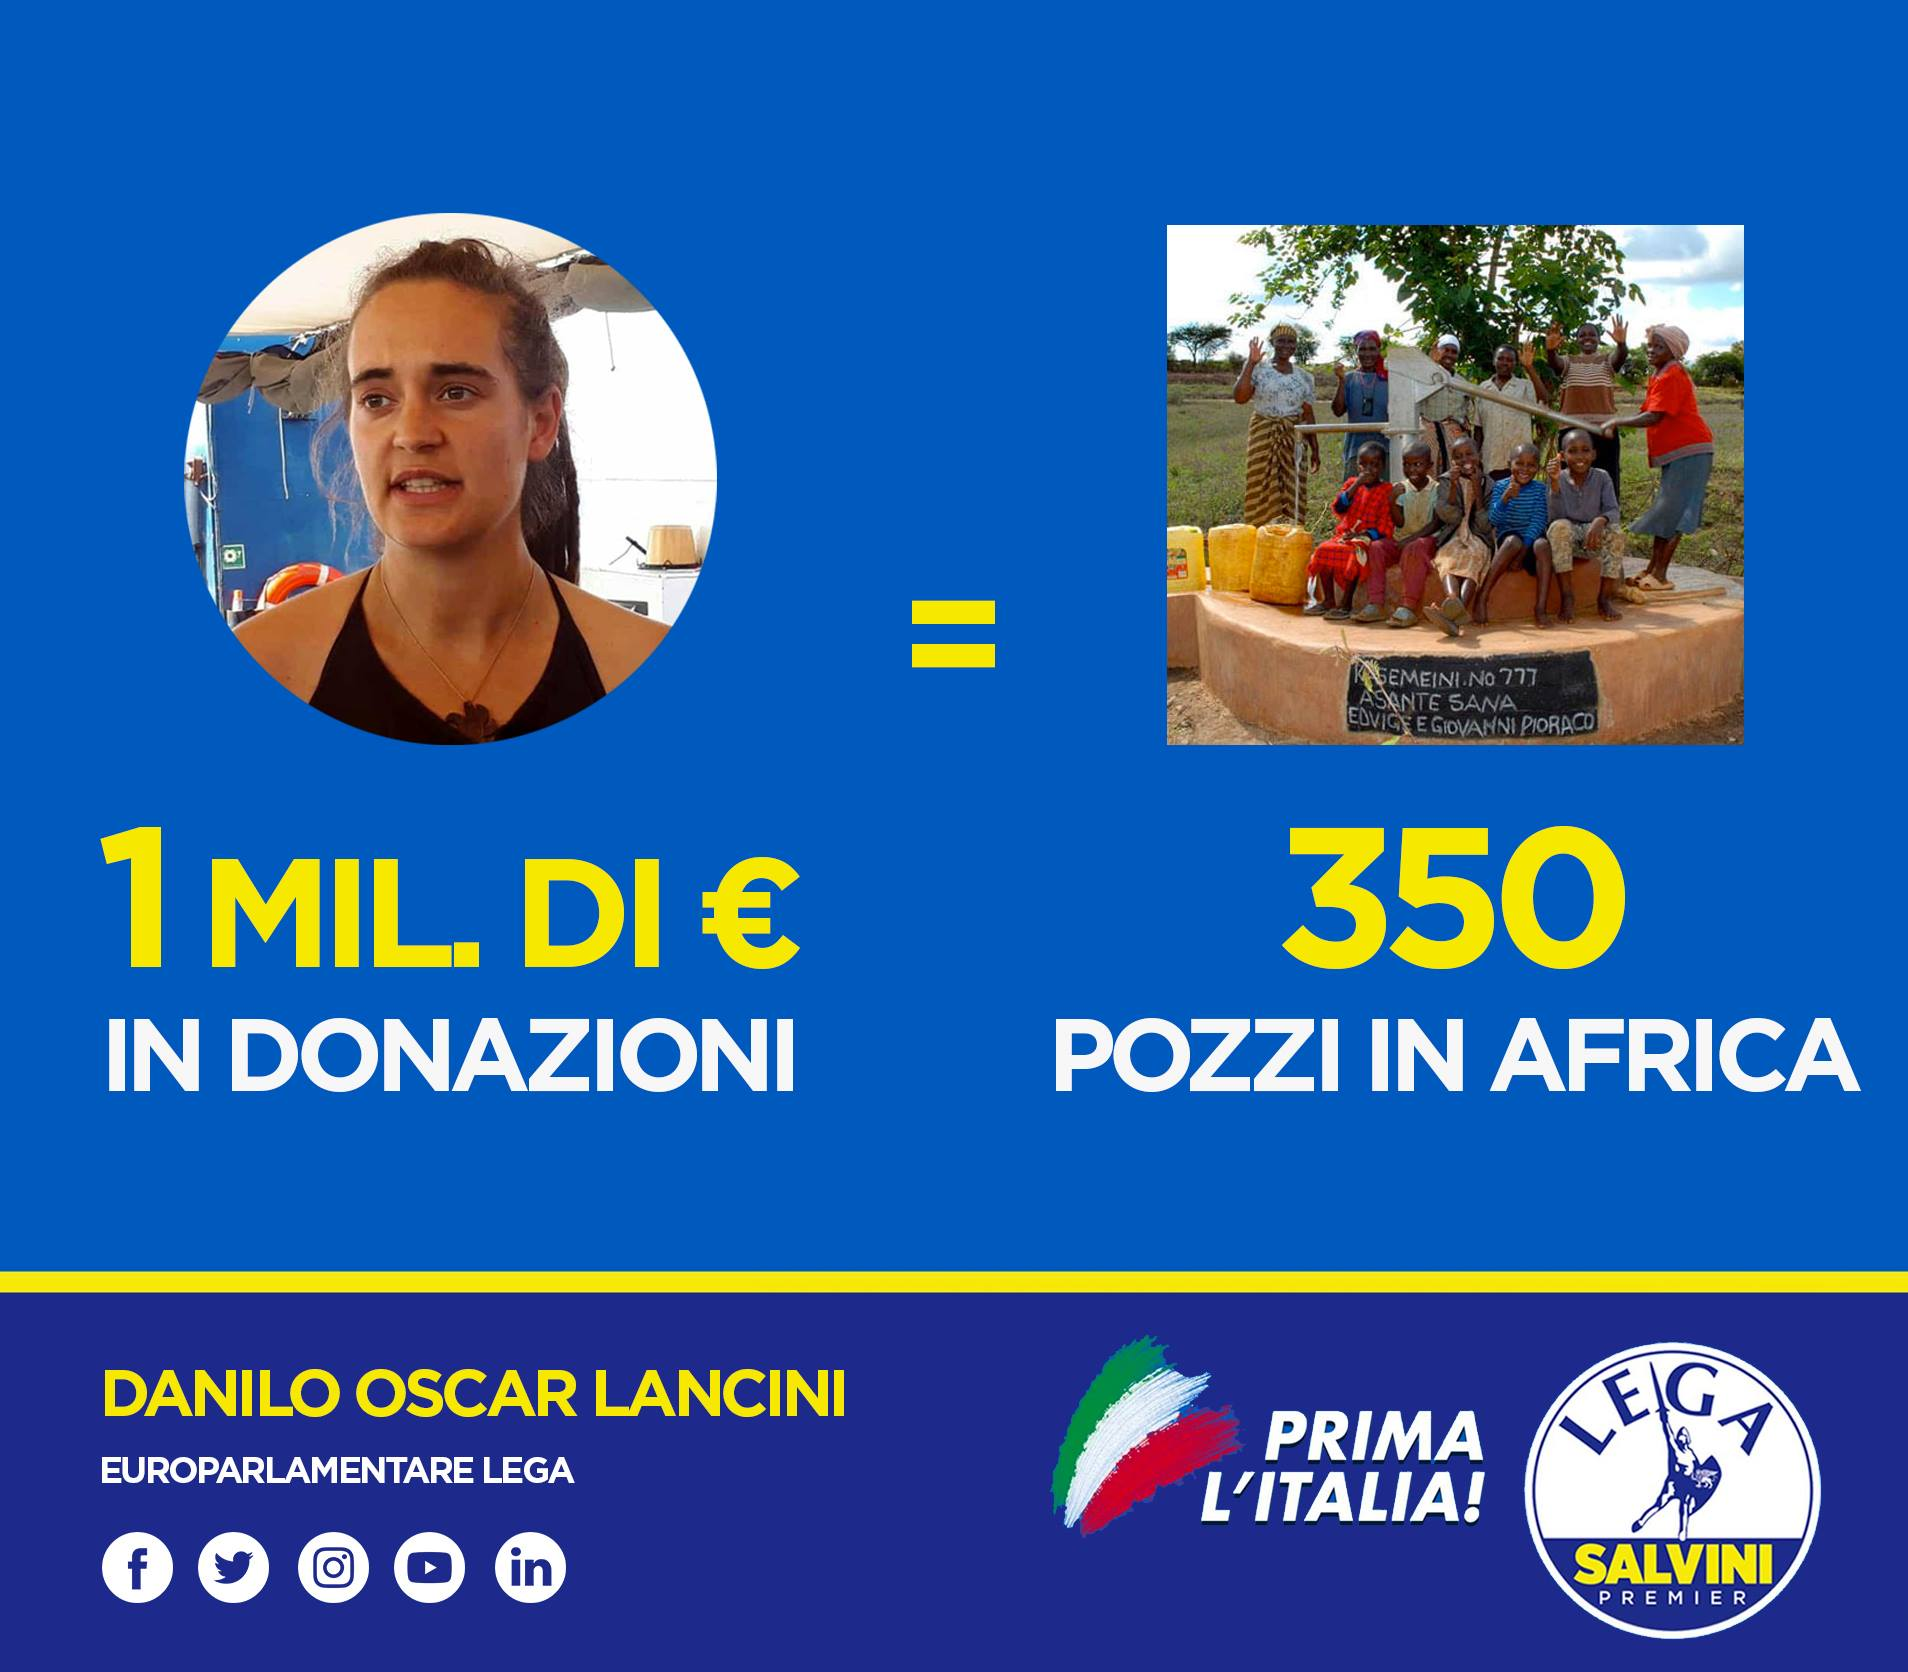 donazioni carola rackete pozzi in africa